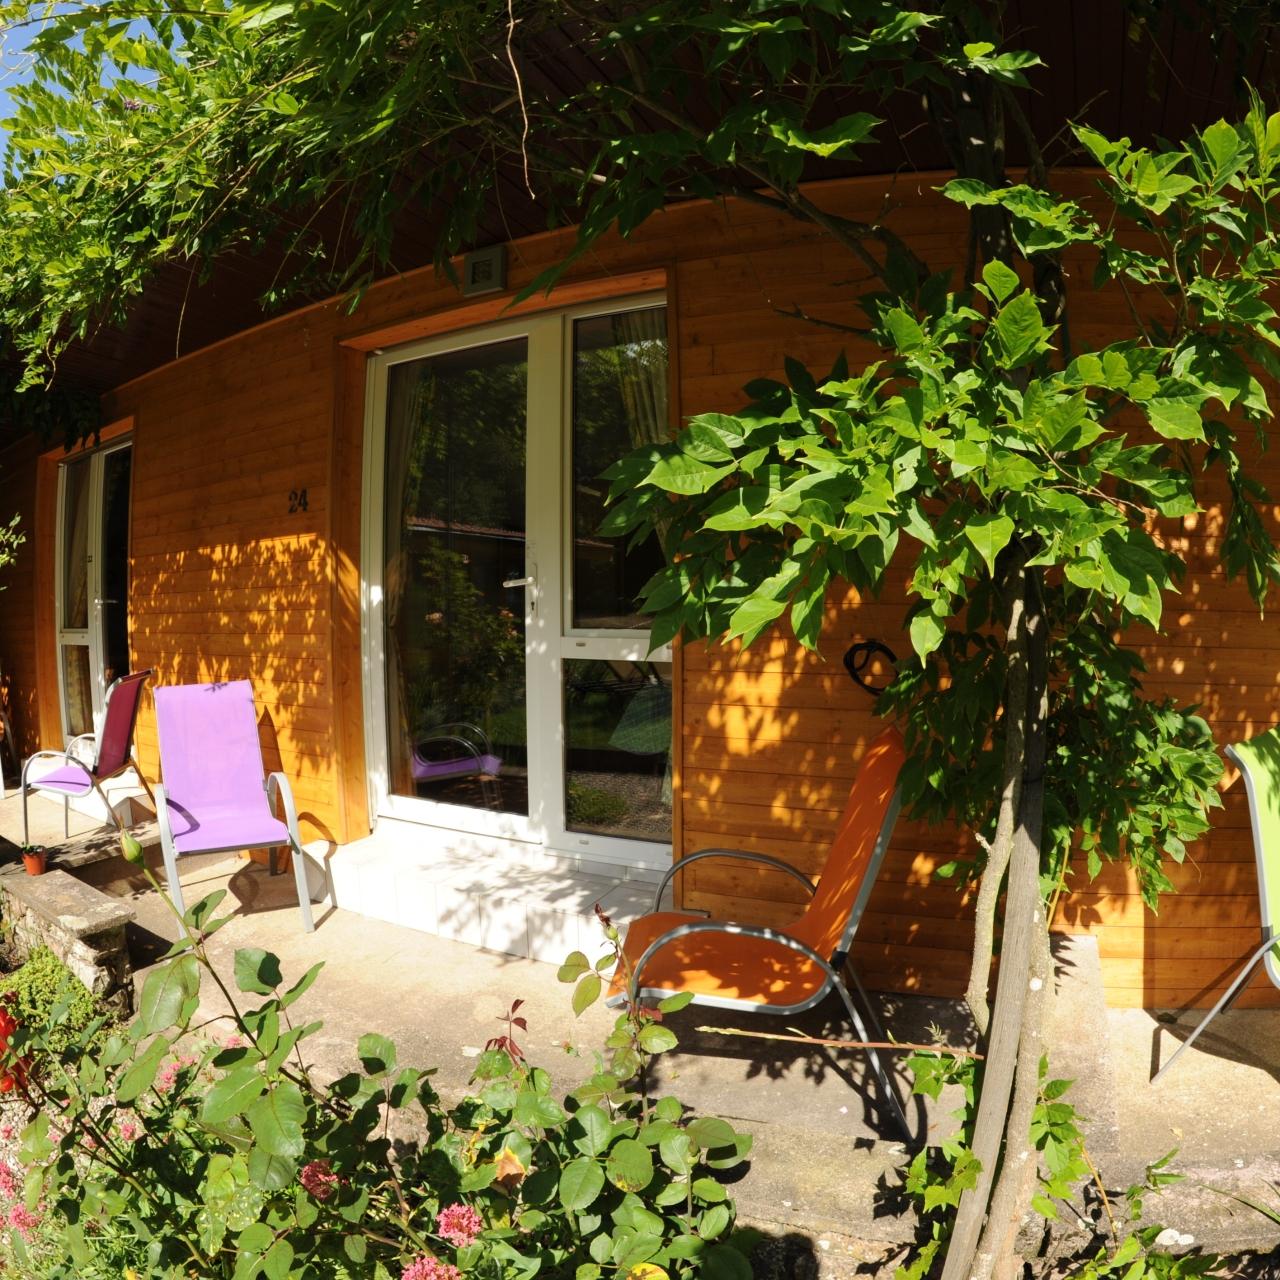 Le Saint Barnabe Hotel Spa 3 Hrs Star Hotel In Murbach Alsace